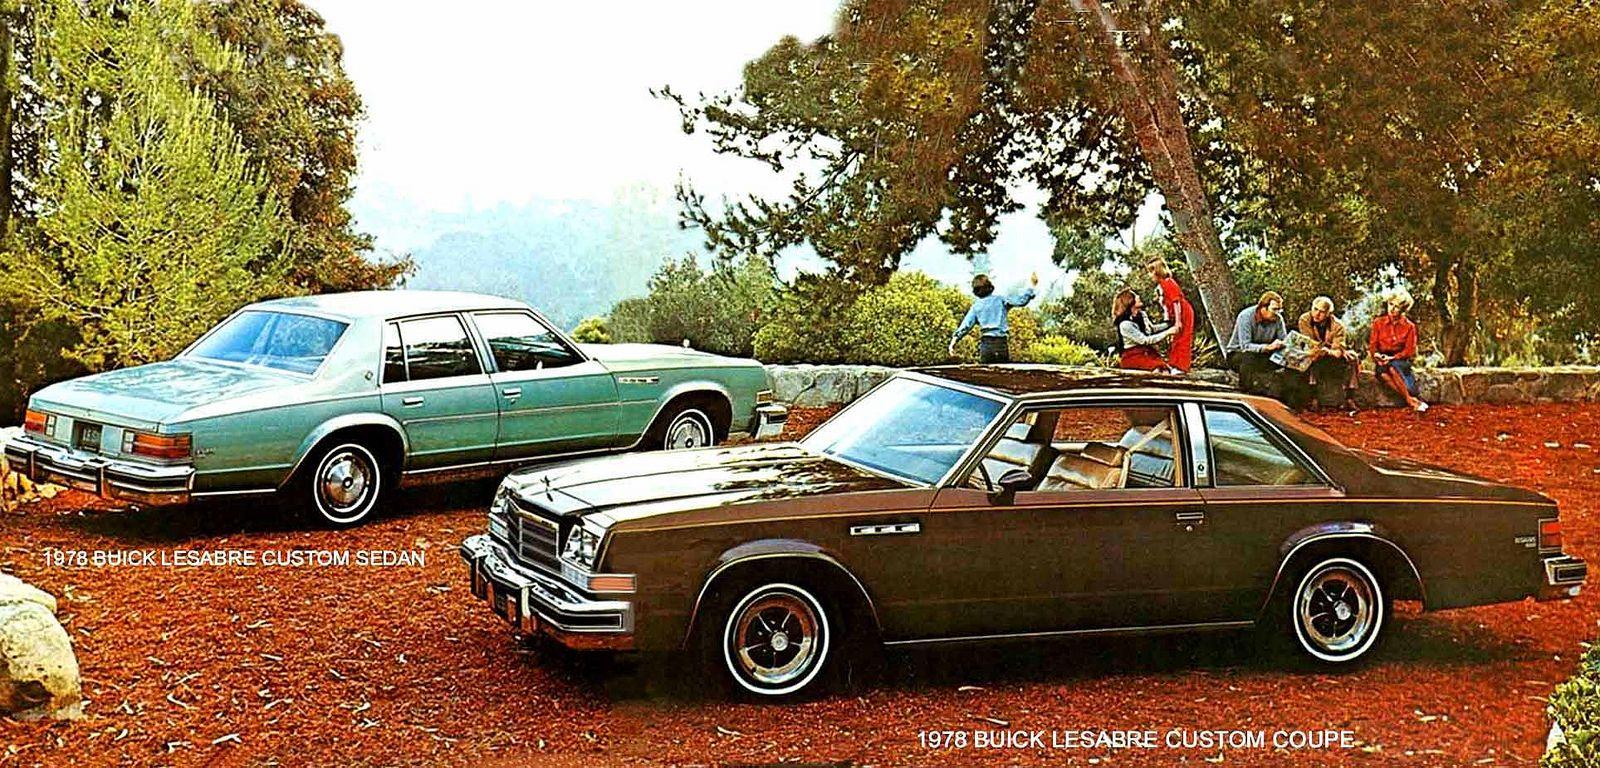 78 Buick Lesabre Coupe And Sedan Large Buick Lesabre Buick Sedan